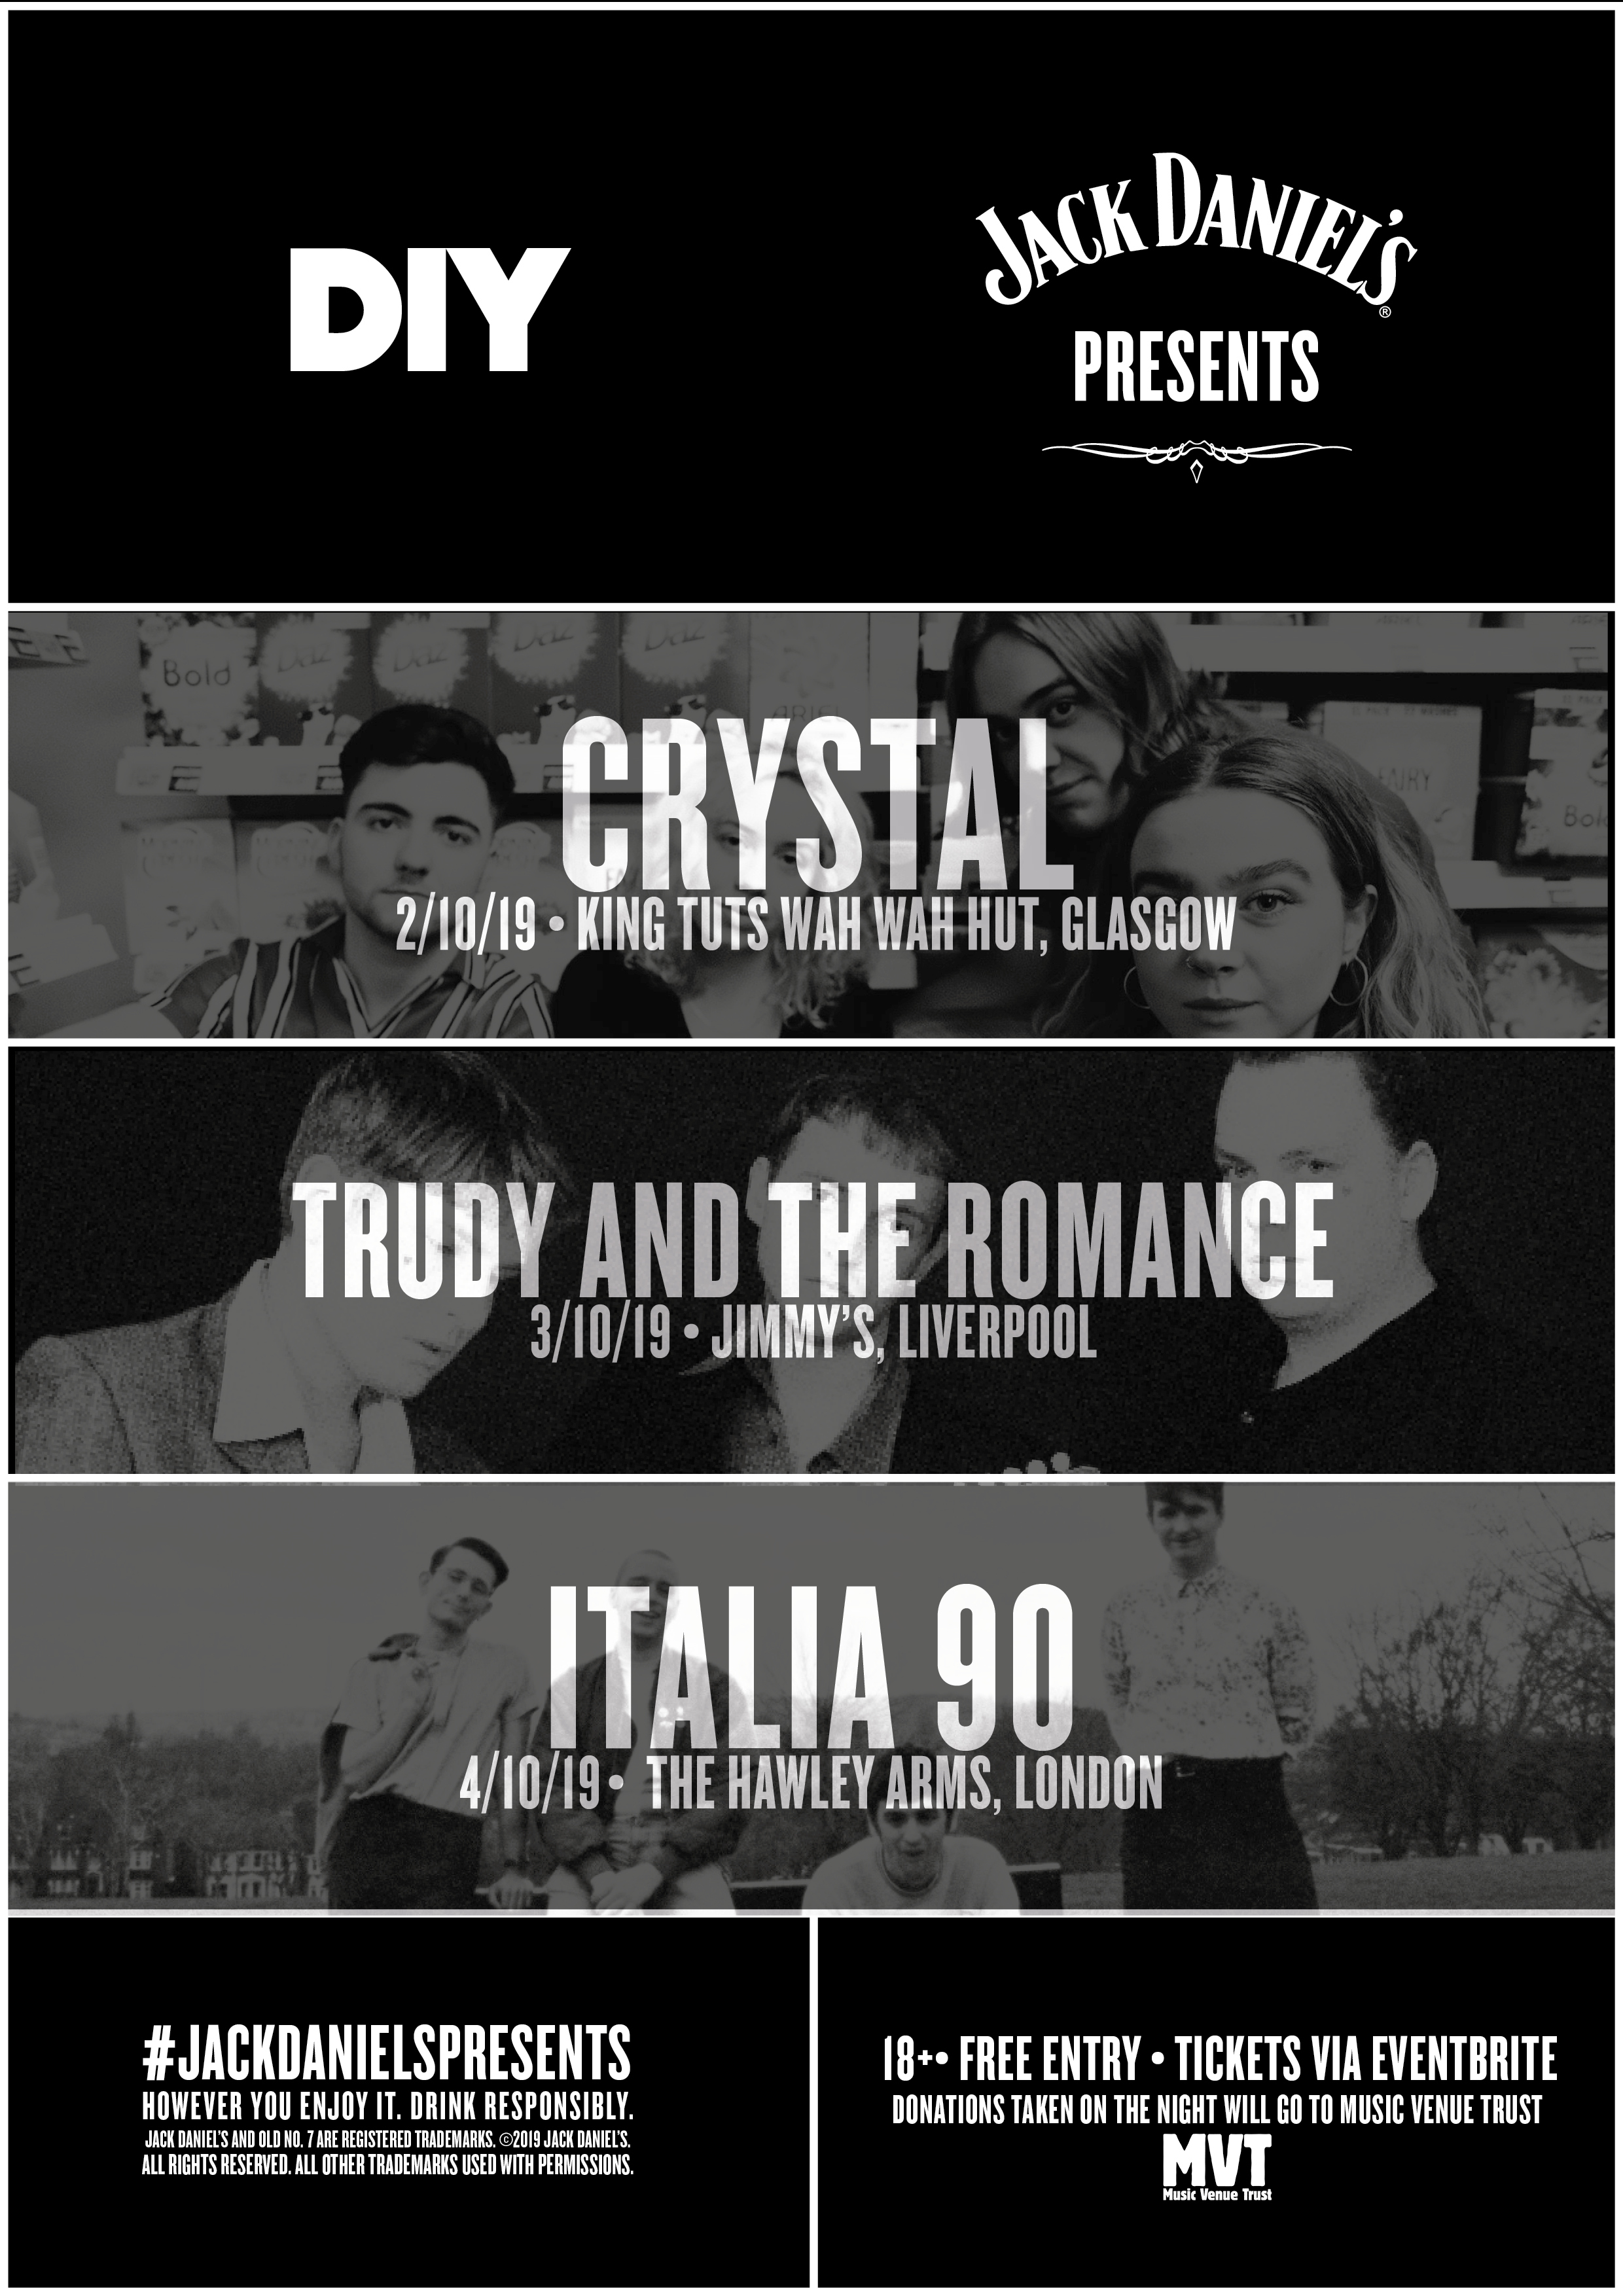 Italia 90, Trudy and the Romance & CRYSTAL for DIY & Jack Daniel's Presents UK mini-tour